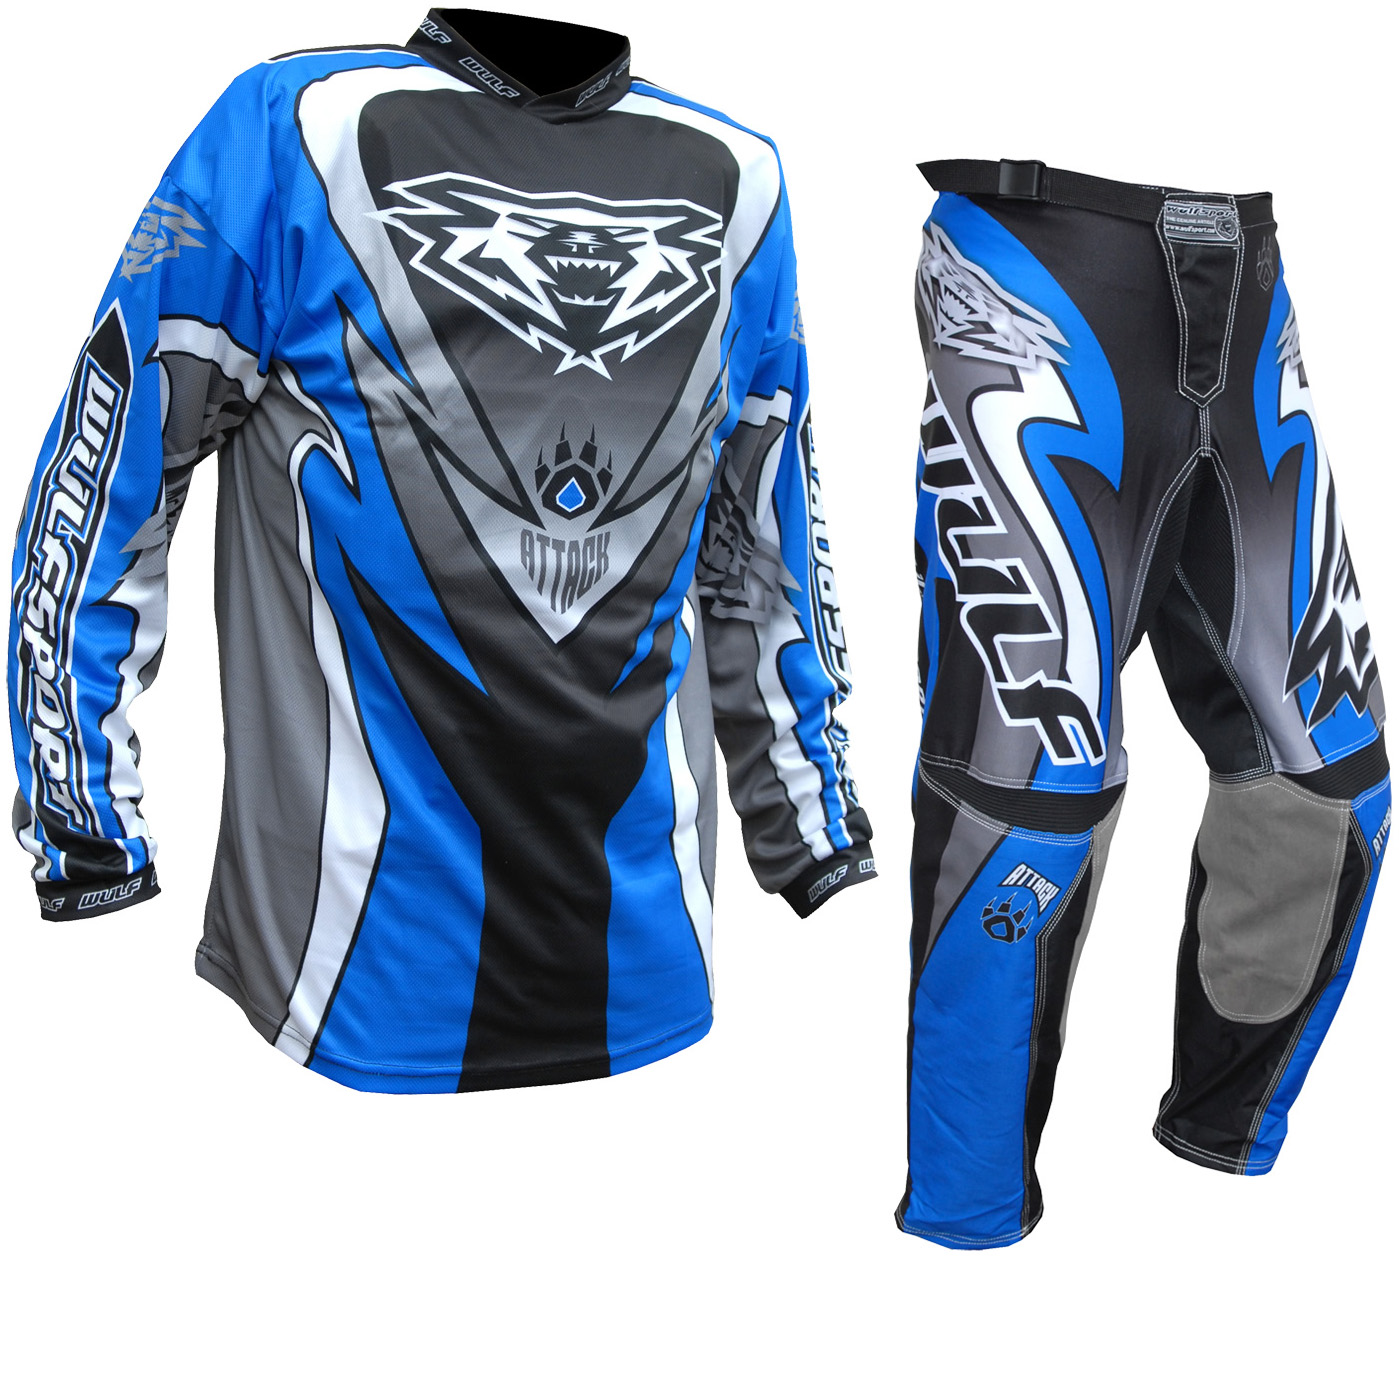 127b44455 Amazon.com  Protective Gear - Motorcycle   Powersports .